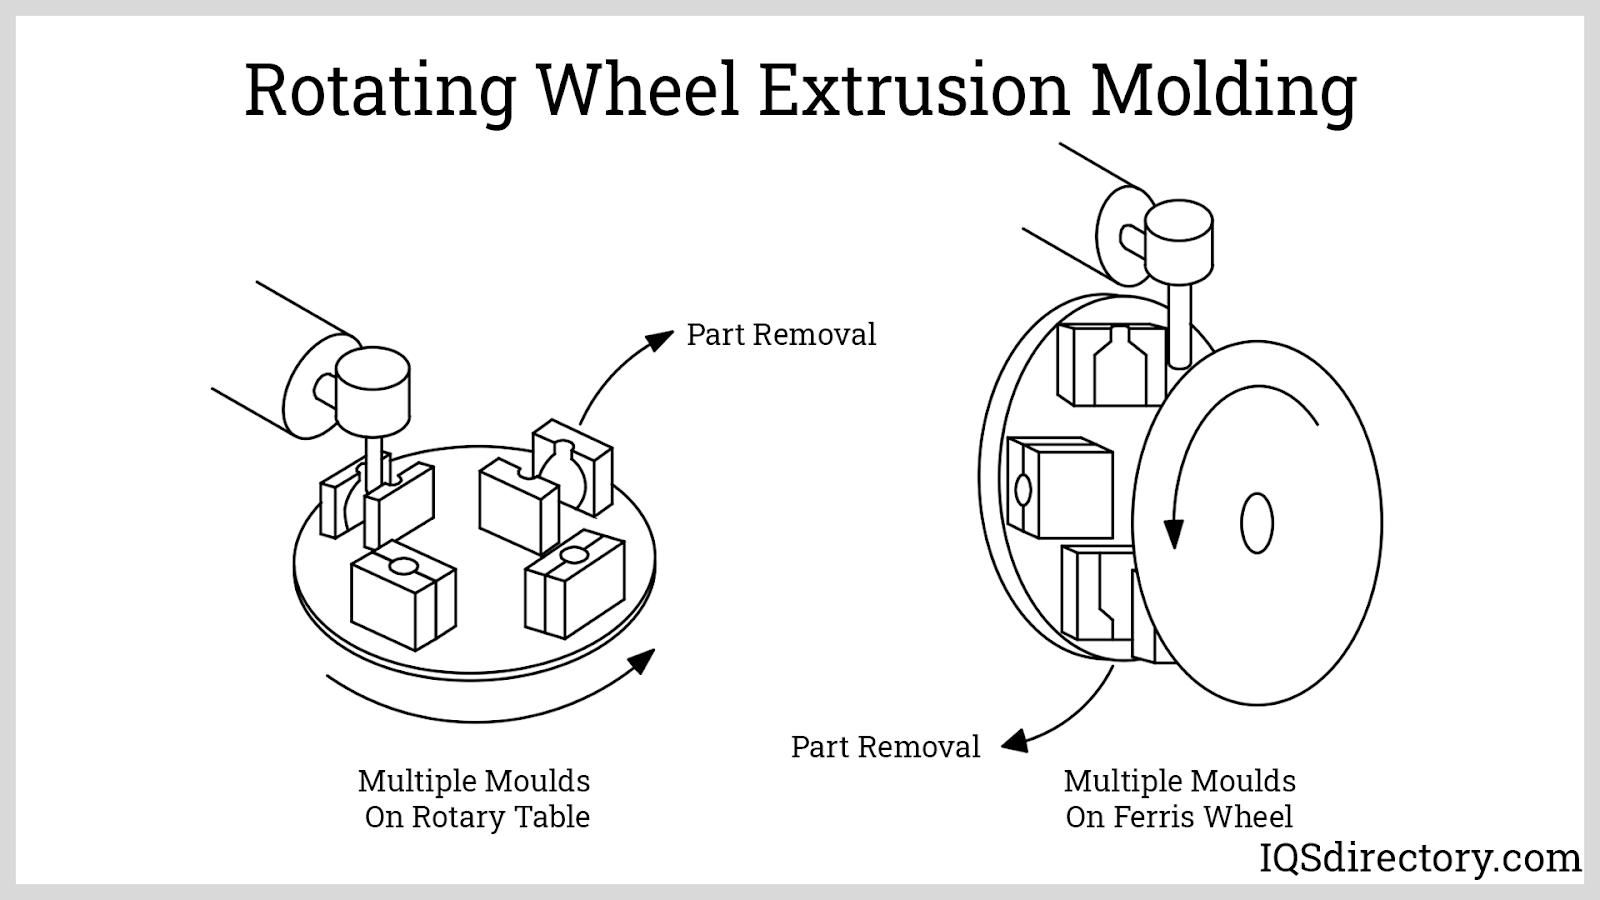 Rotating Wheel Extrusion Molding